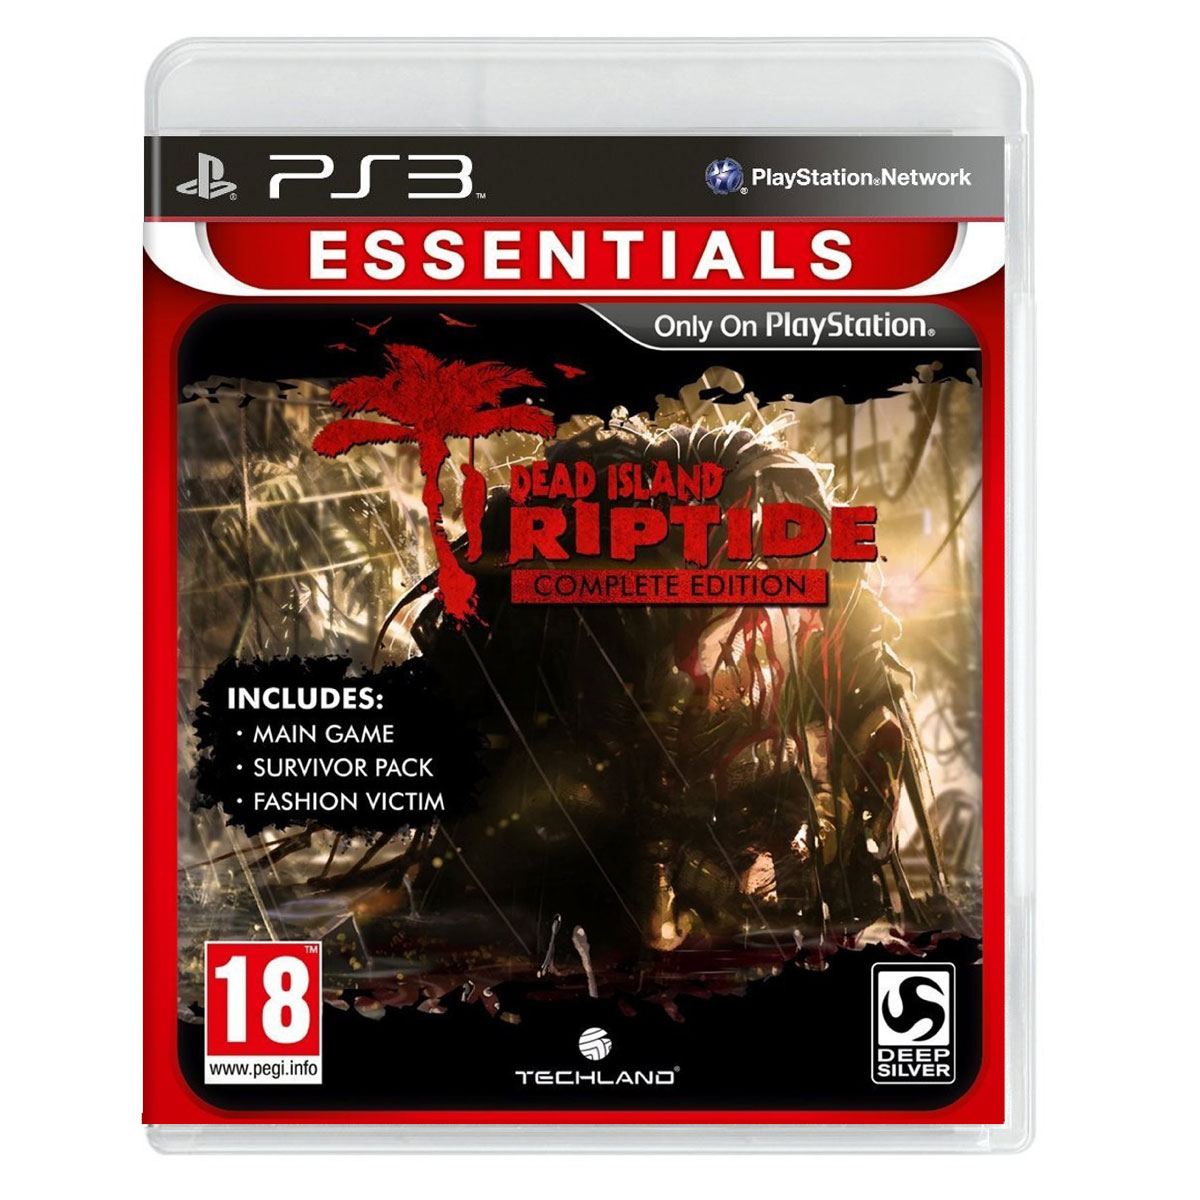 LDLC.com Dead Island : Riptide - Edition Complète Essentials (PS3) Dead Island : Riptide - Edition Complète Essentials (PS3)